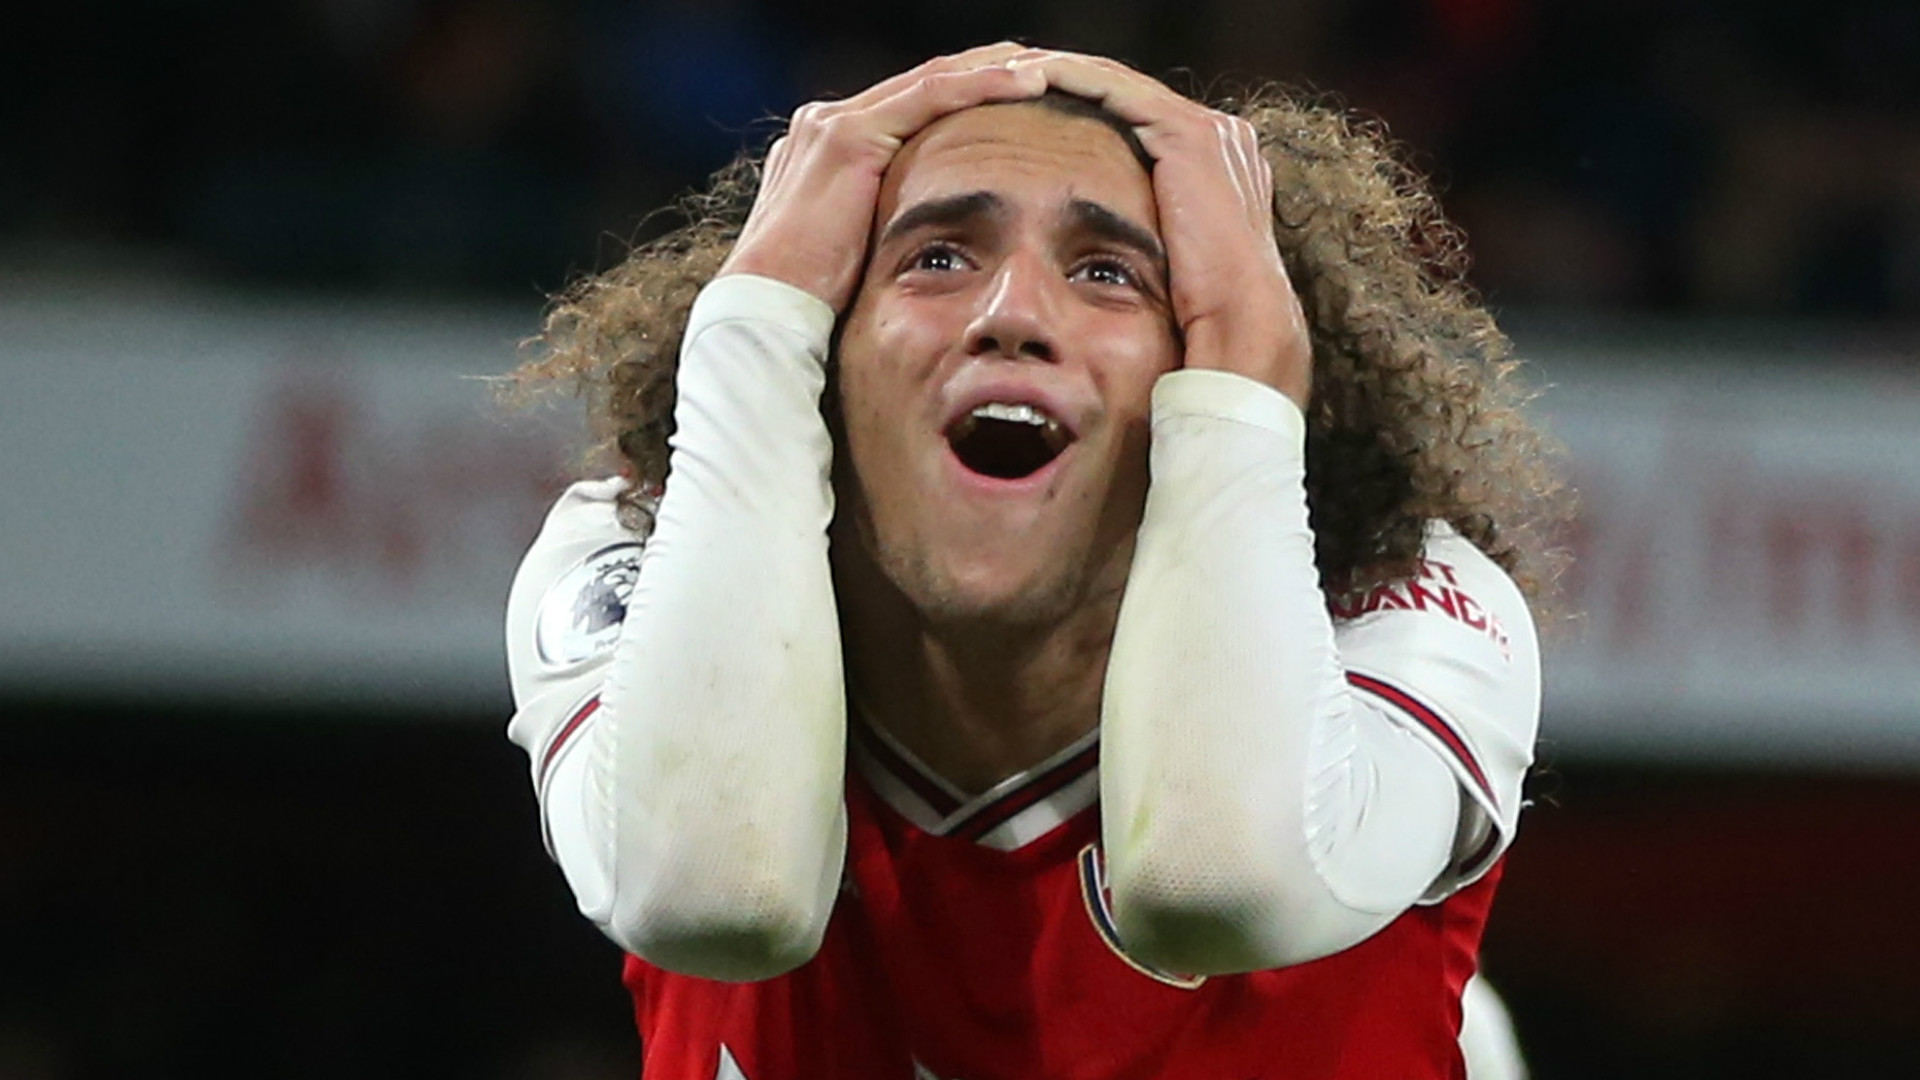 Arteta warns Arsenal stars amid Guendouzi exit reports